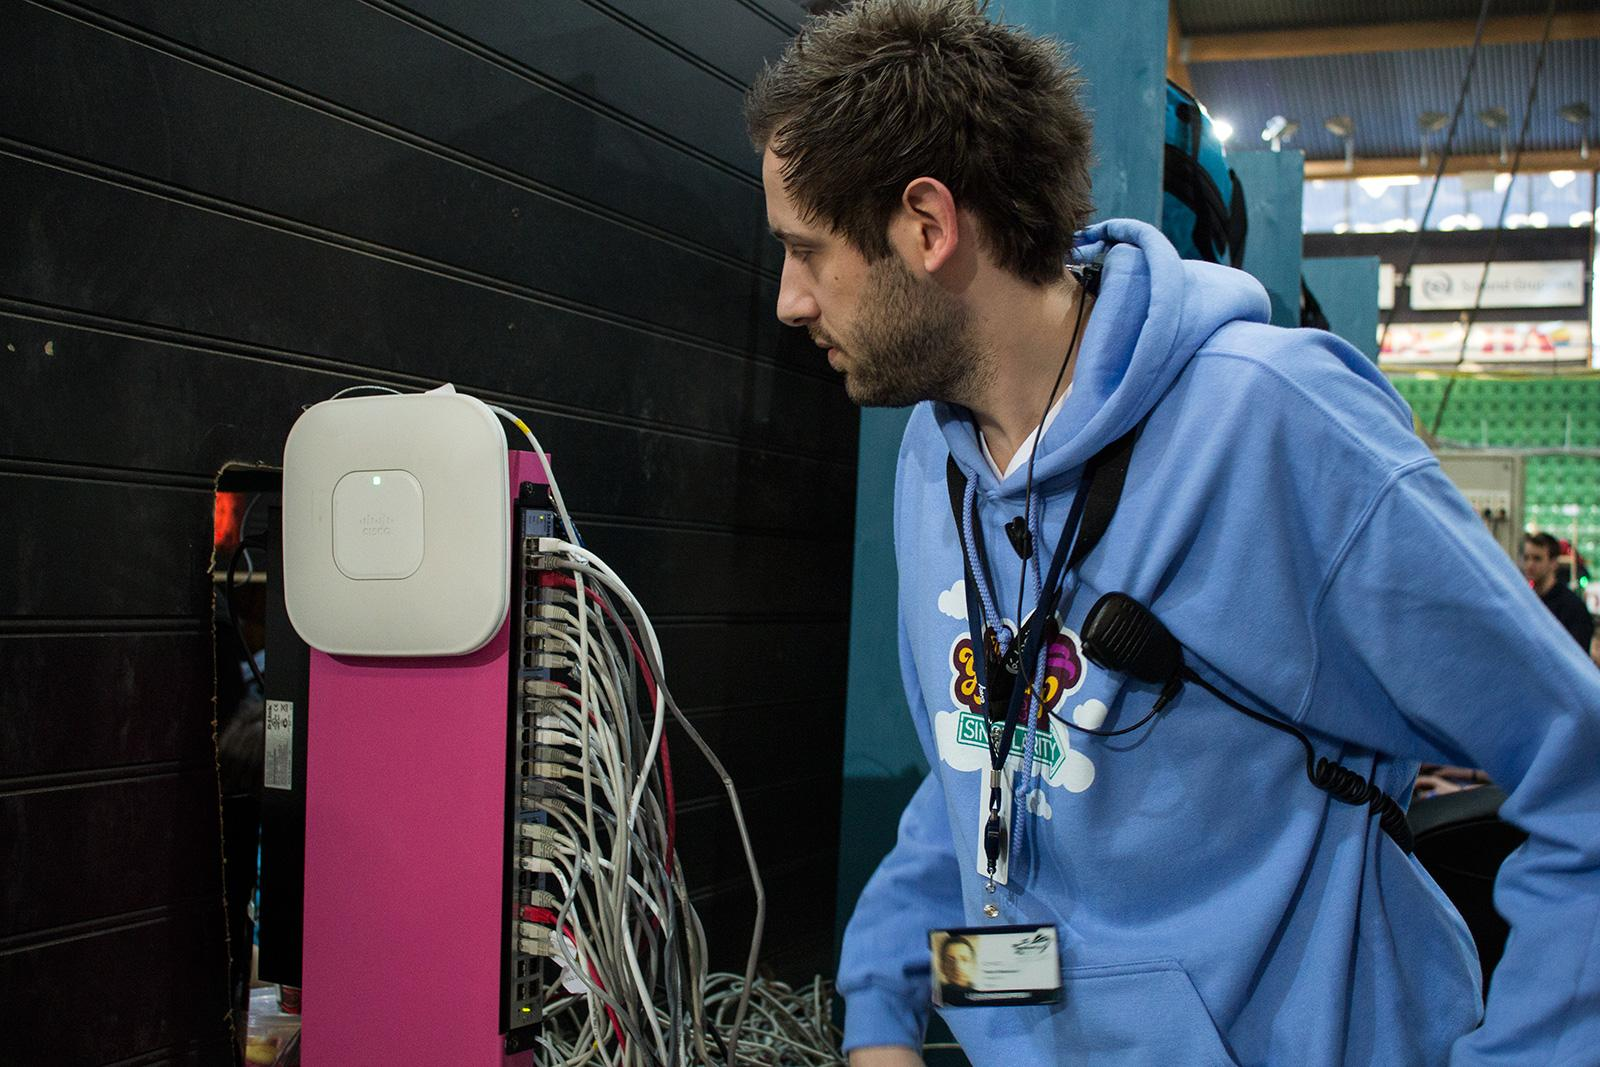 Teknisk ansvarlig Peter Blakstad forteller at nettverket funker som det skal.Foto: Varg Aamo, hardware.no